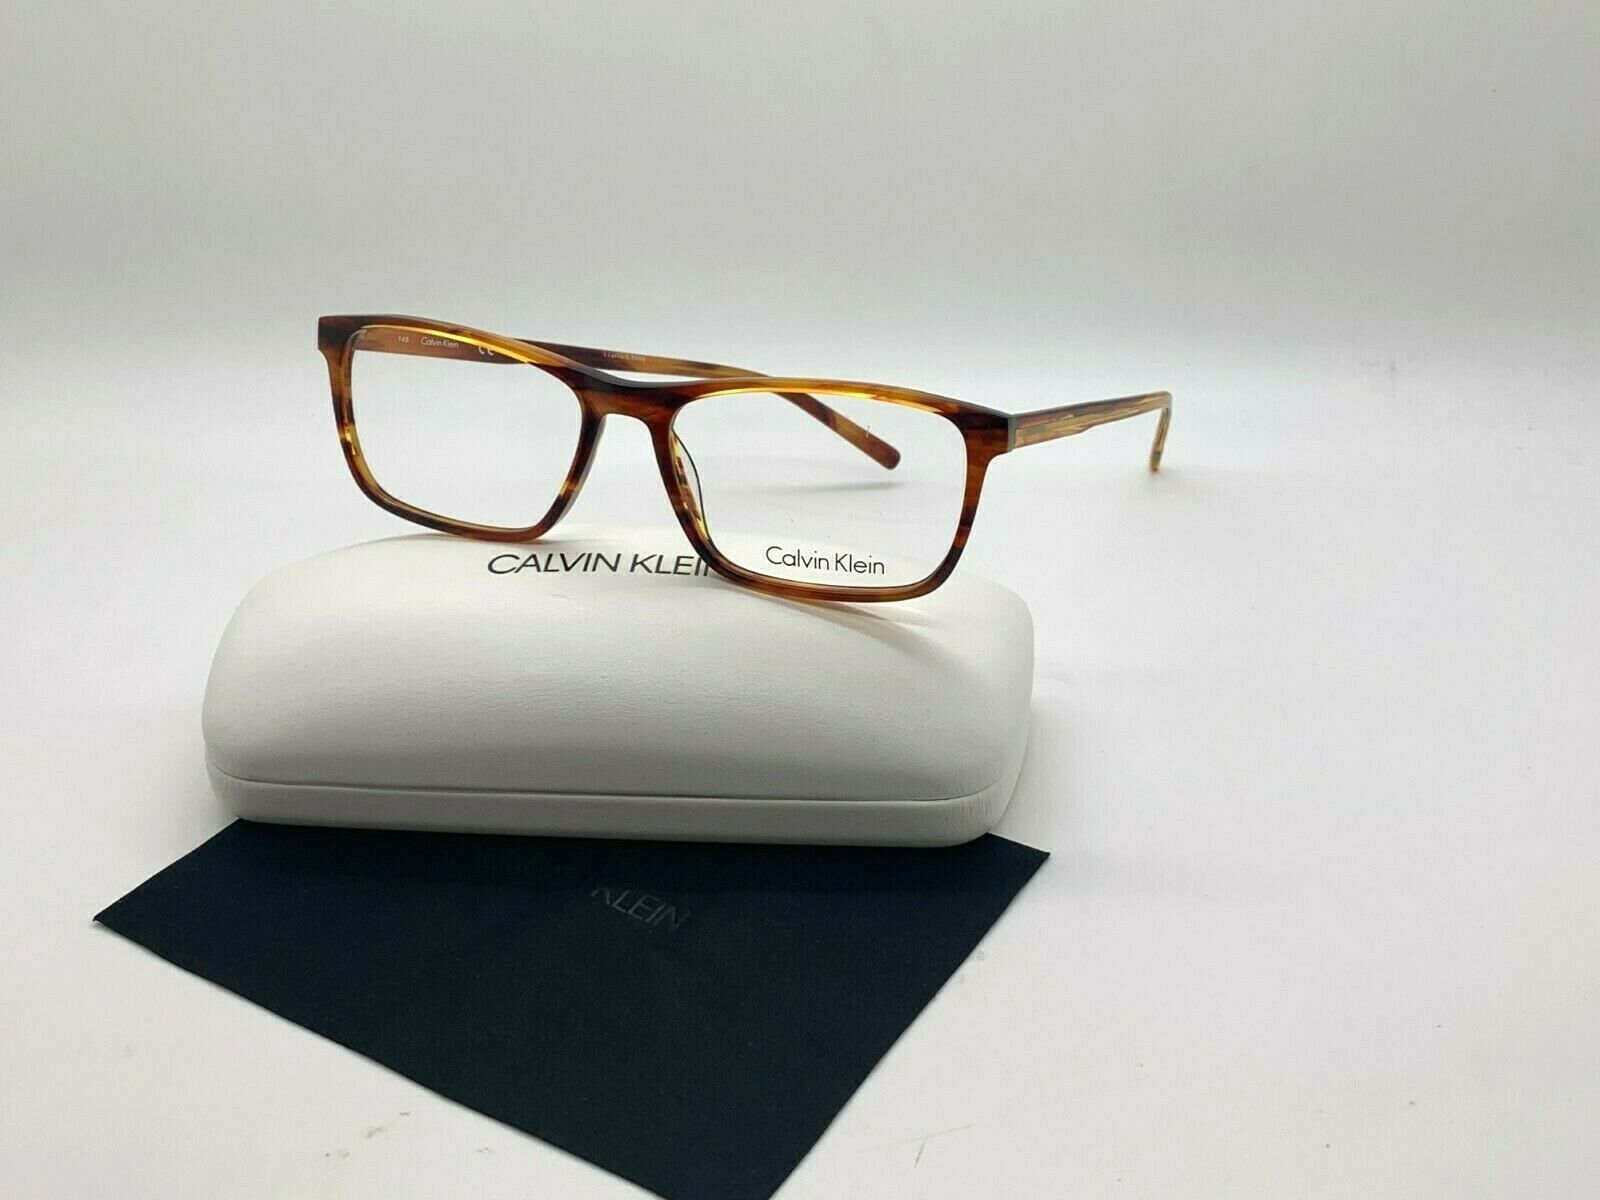 Calvin Klein CK 6009 203 STRIPPED HAVANA Eyeglasses Frames 55-16-145MM /CASE - $41.68